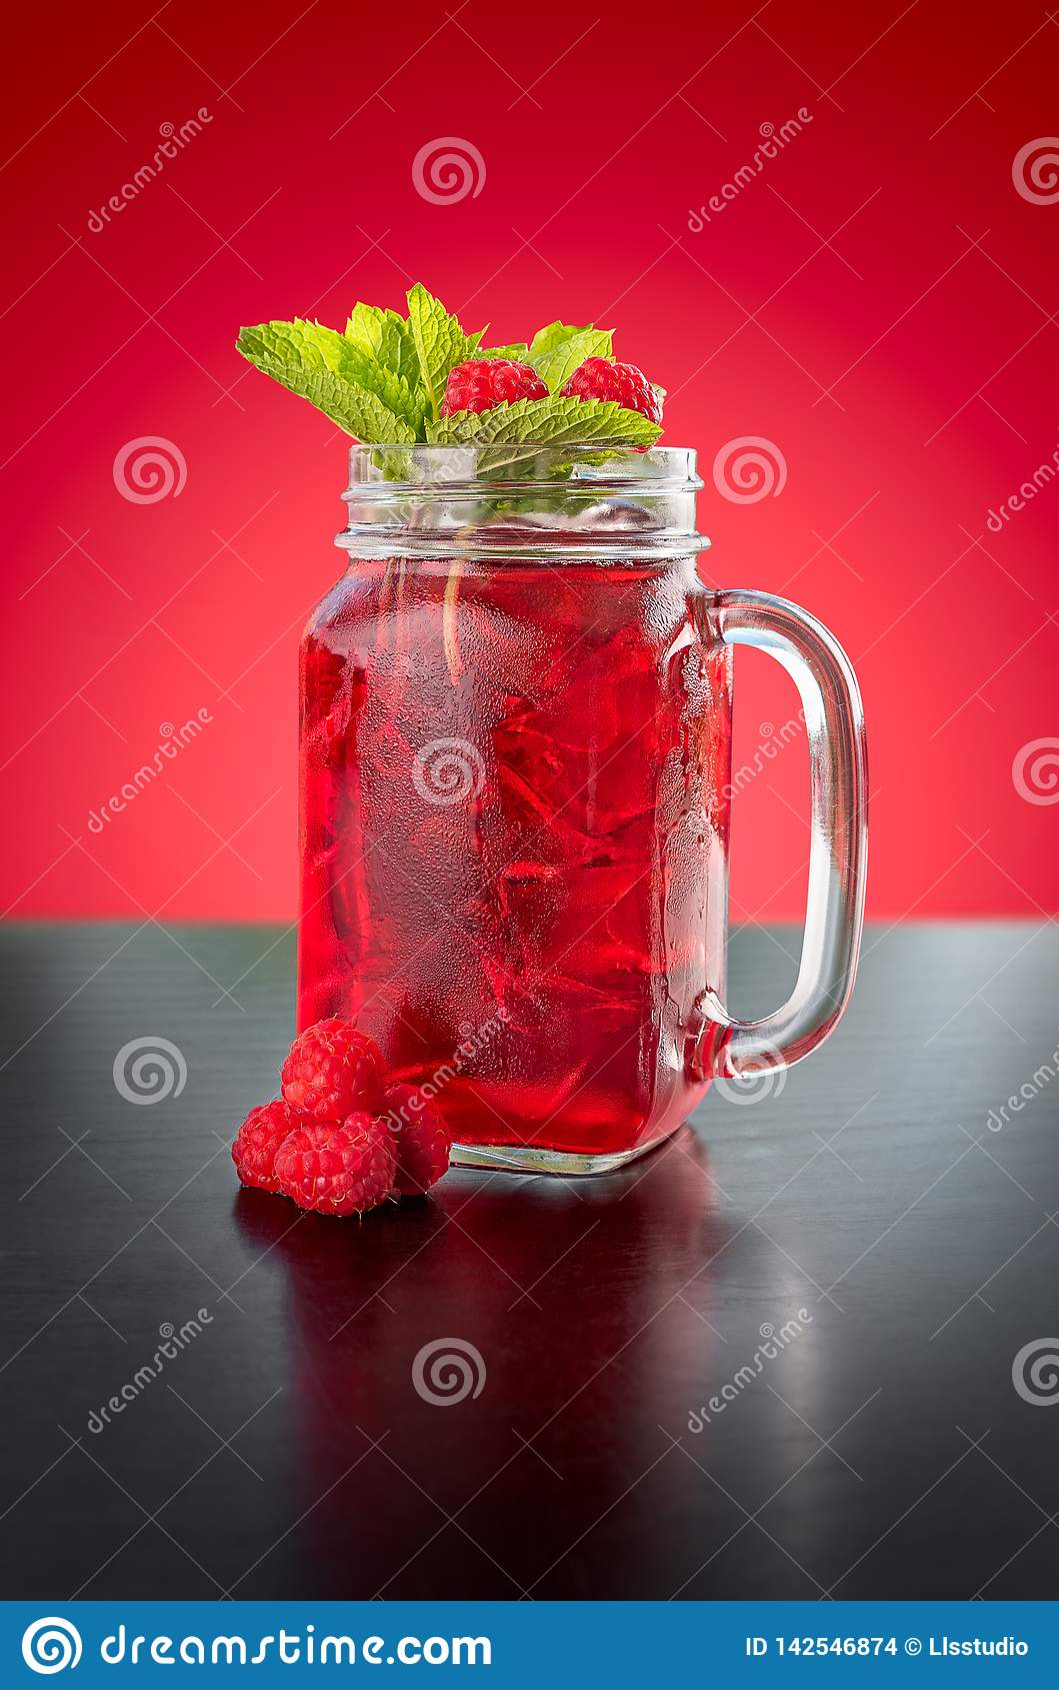 Homemade Berry Ice Tea in a glass jar.